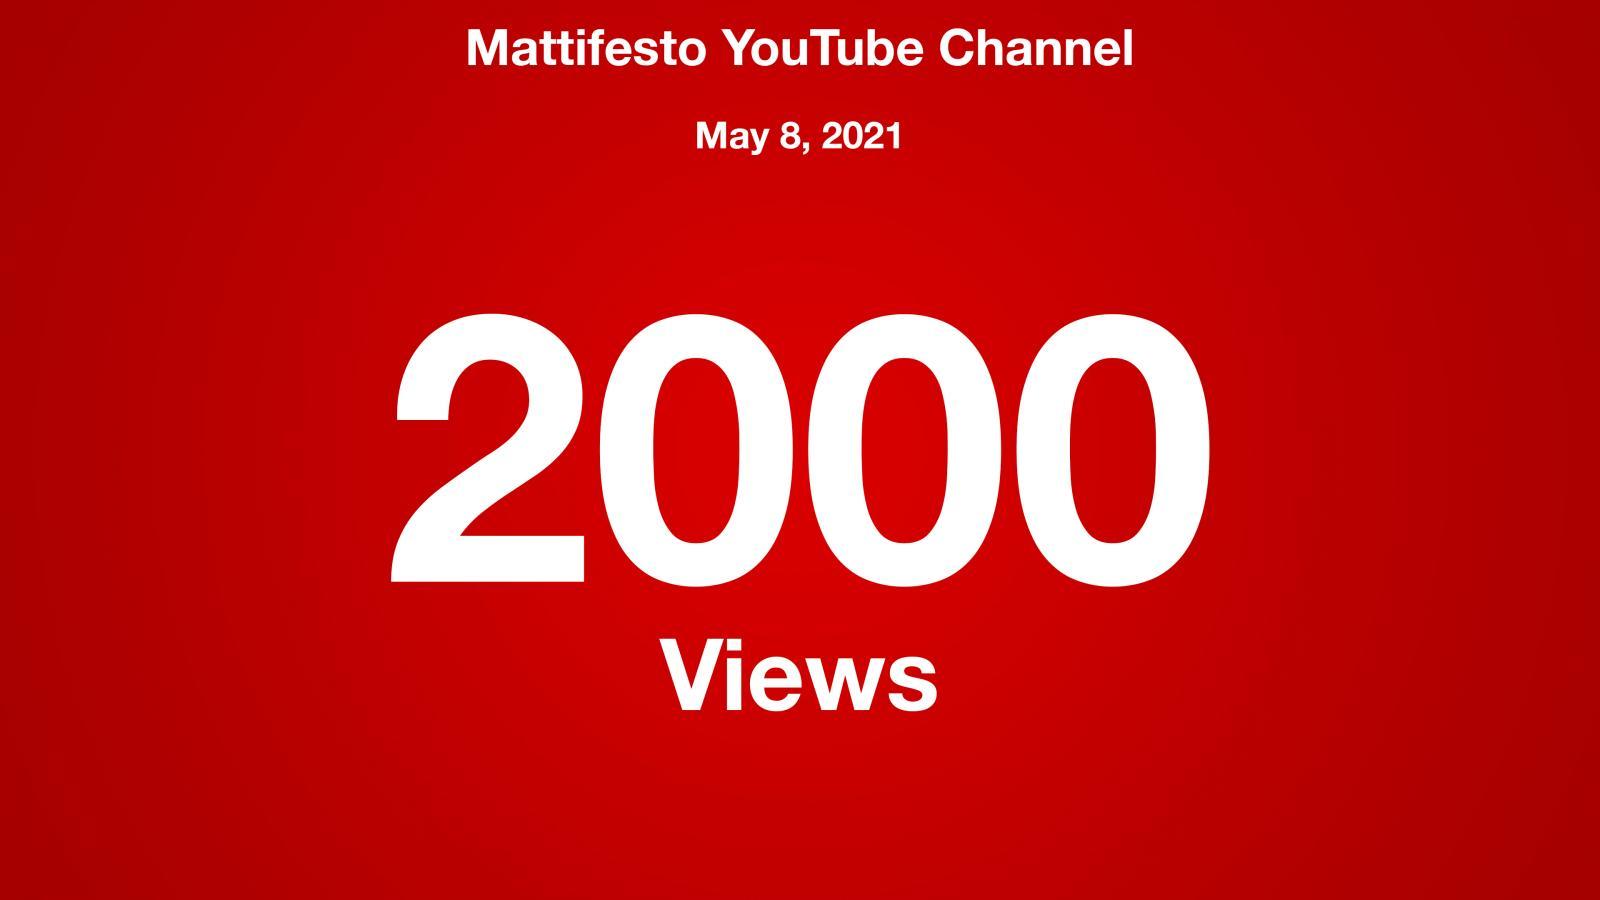 Mattifesto YouTube Channel, May 8 2021, 2000 Views